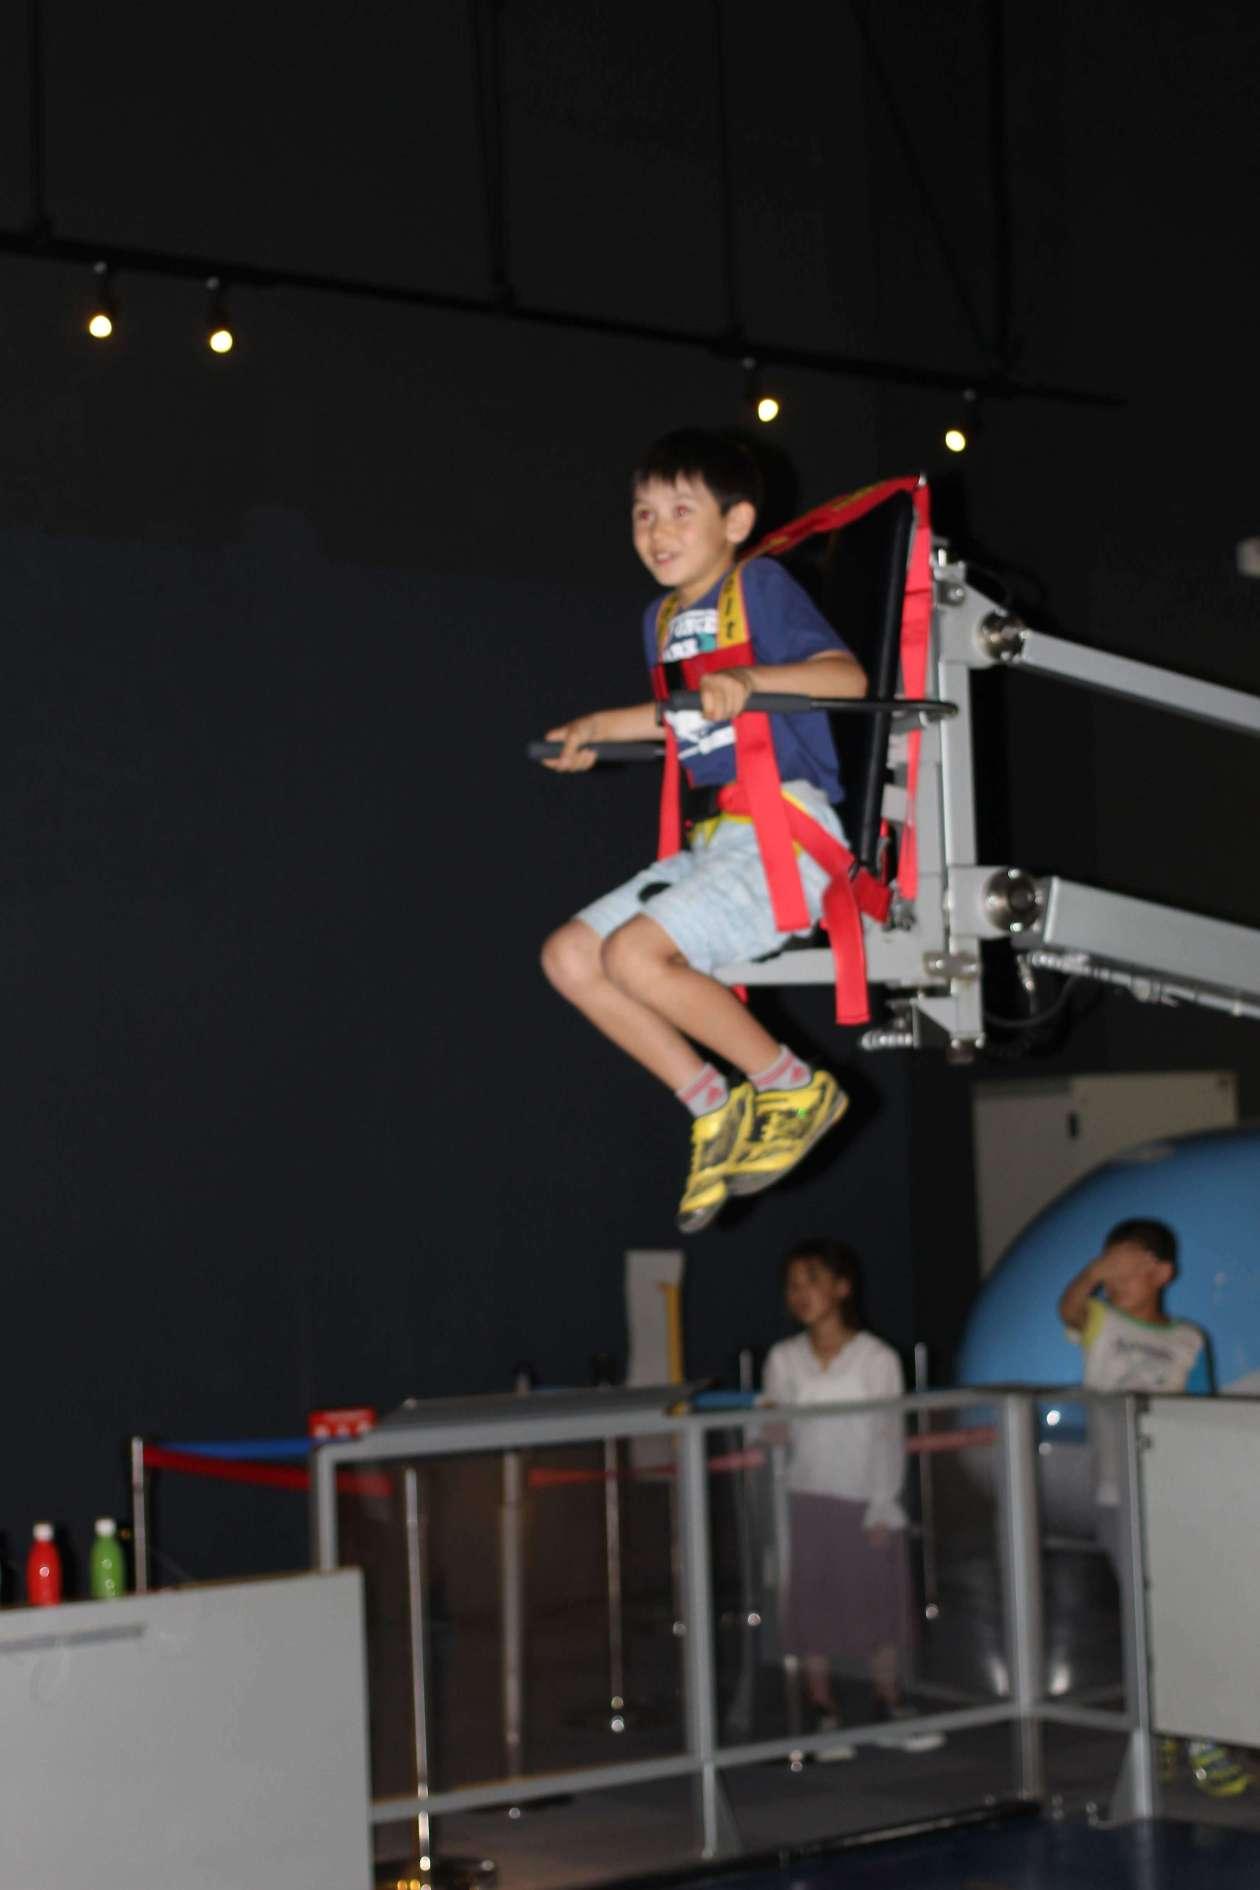 Moon walker at Tokorozawa Aviation Museum in Tokorozawa Aviation Memorial Park